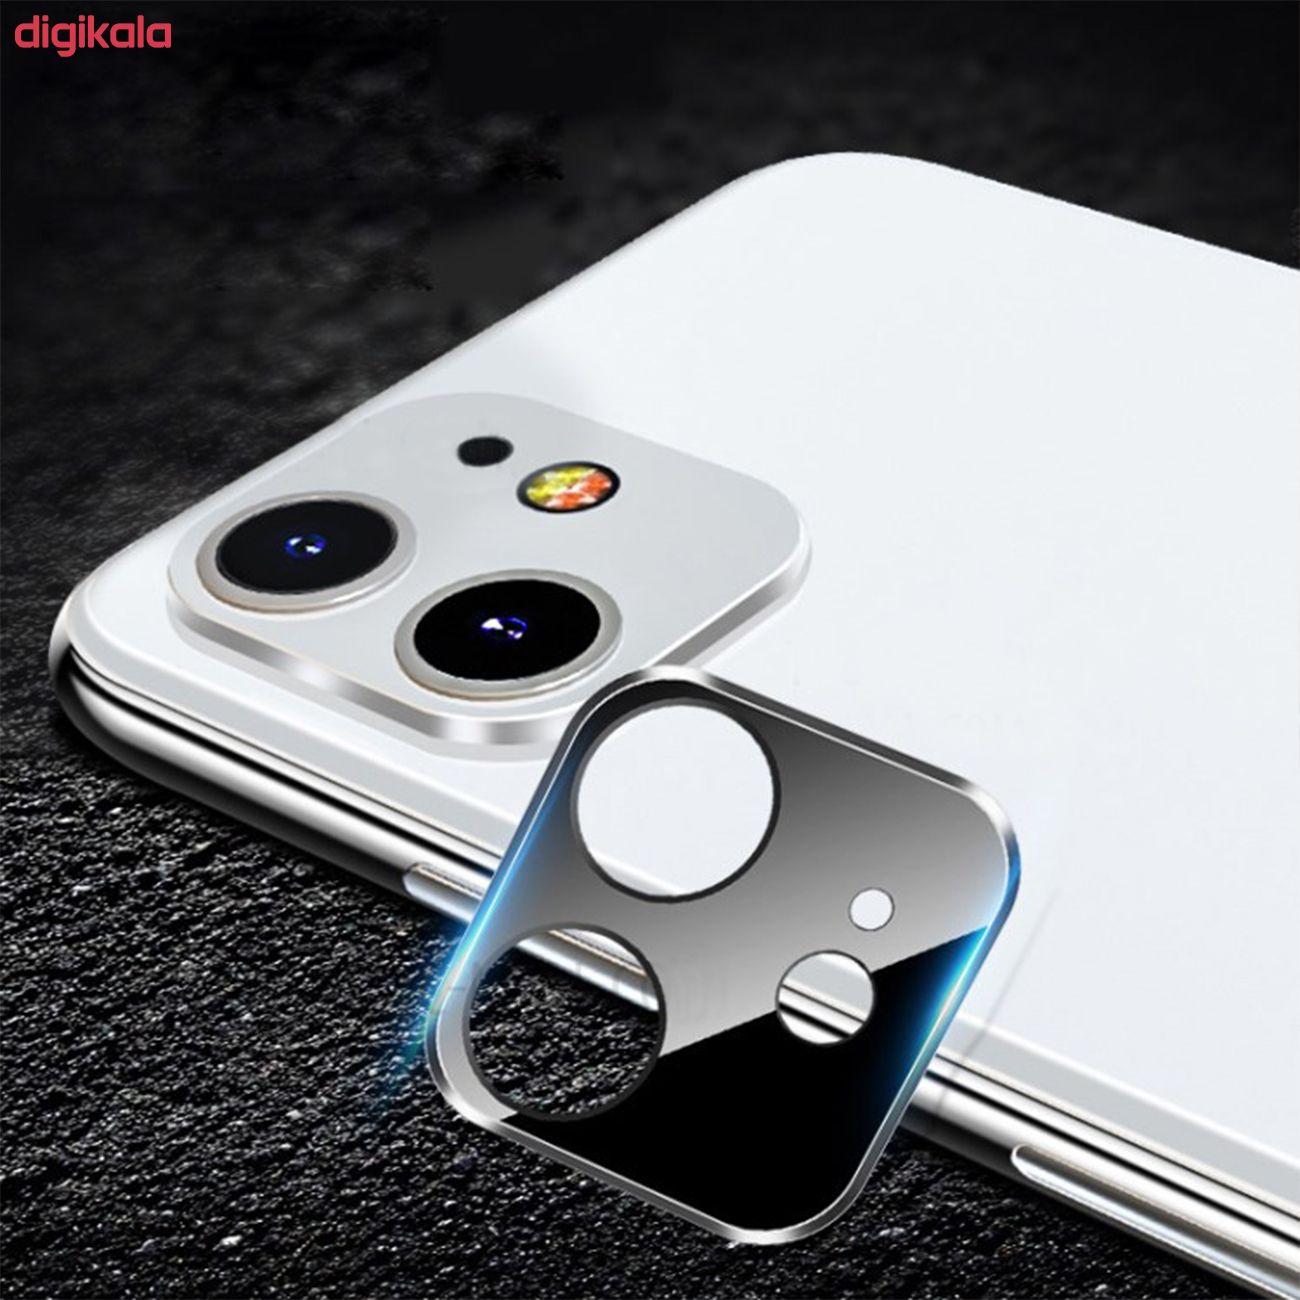 محافظ لنز دوربین مدل Me-1 مناسب برای گوشی موبایل اپل iPhone 11 main 1 3